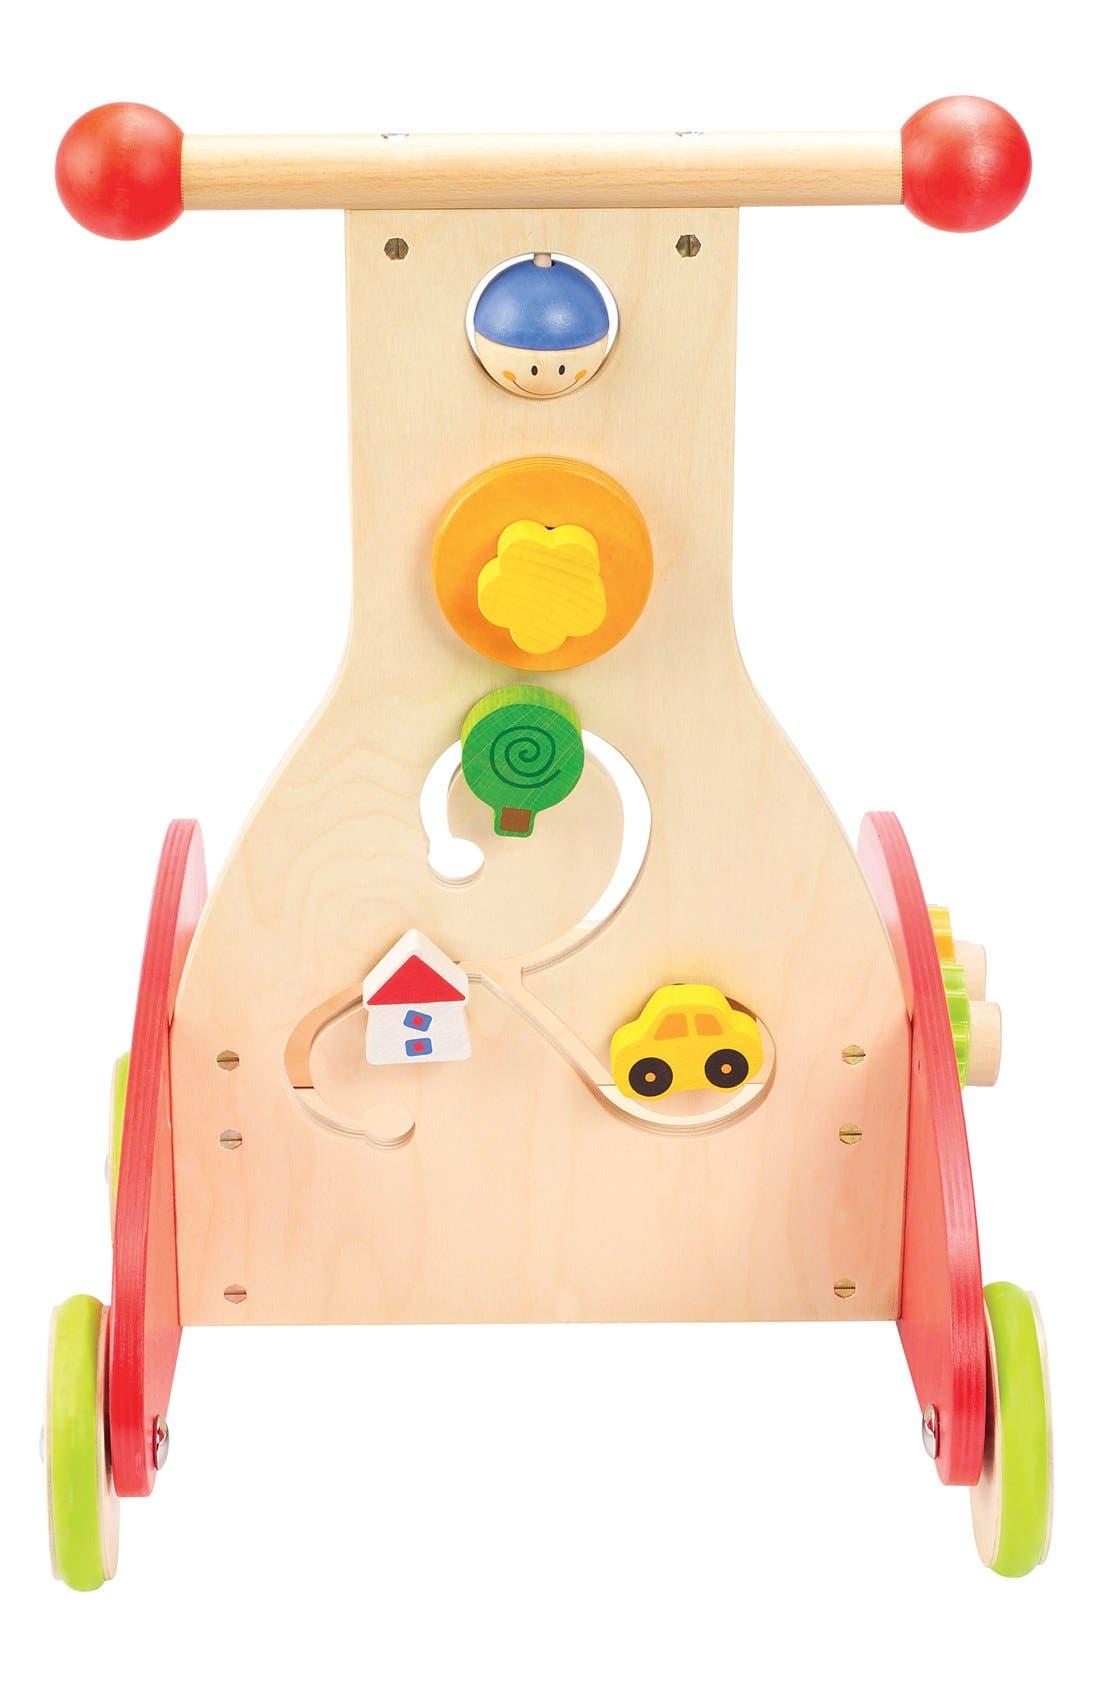 HAPE 'Wonder Walker' Push-Pull Toy